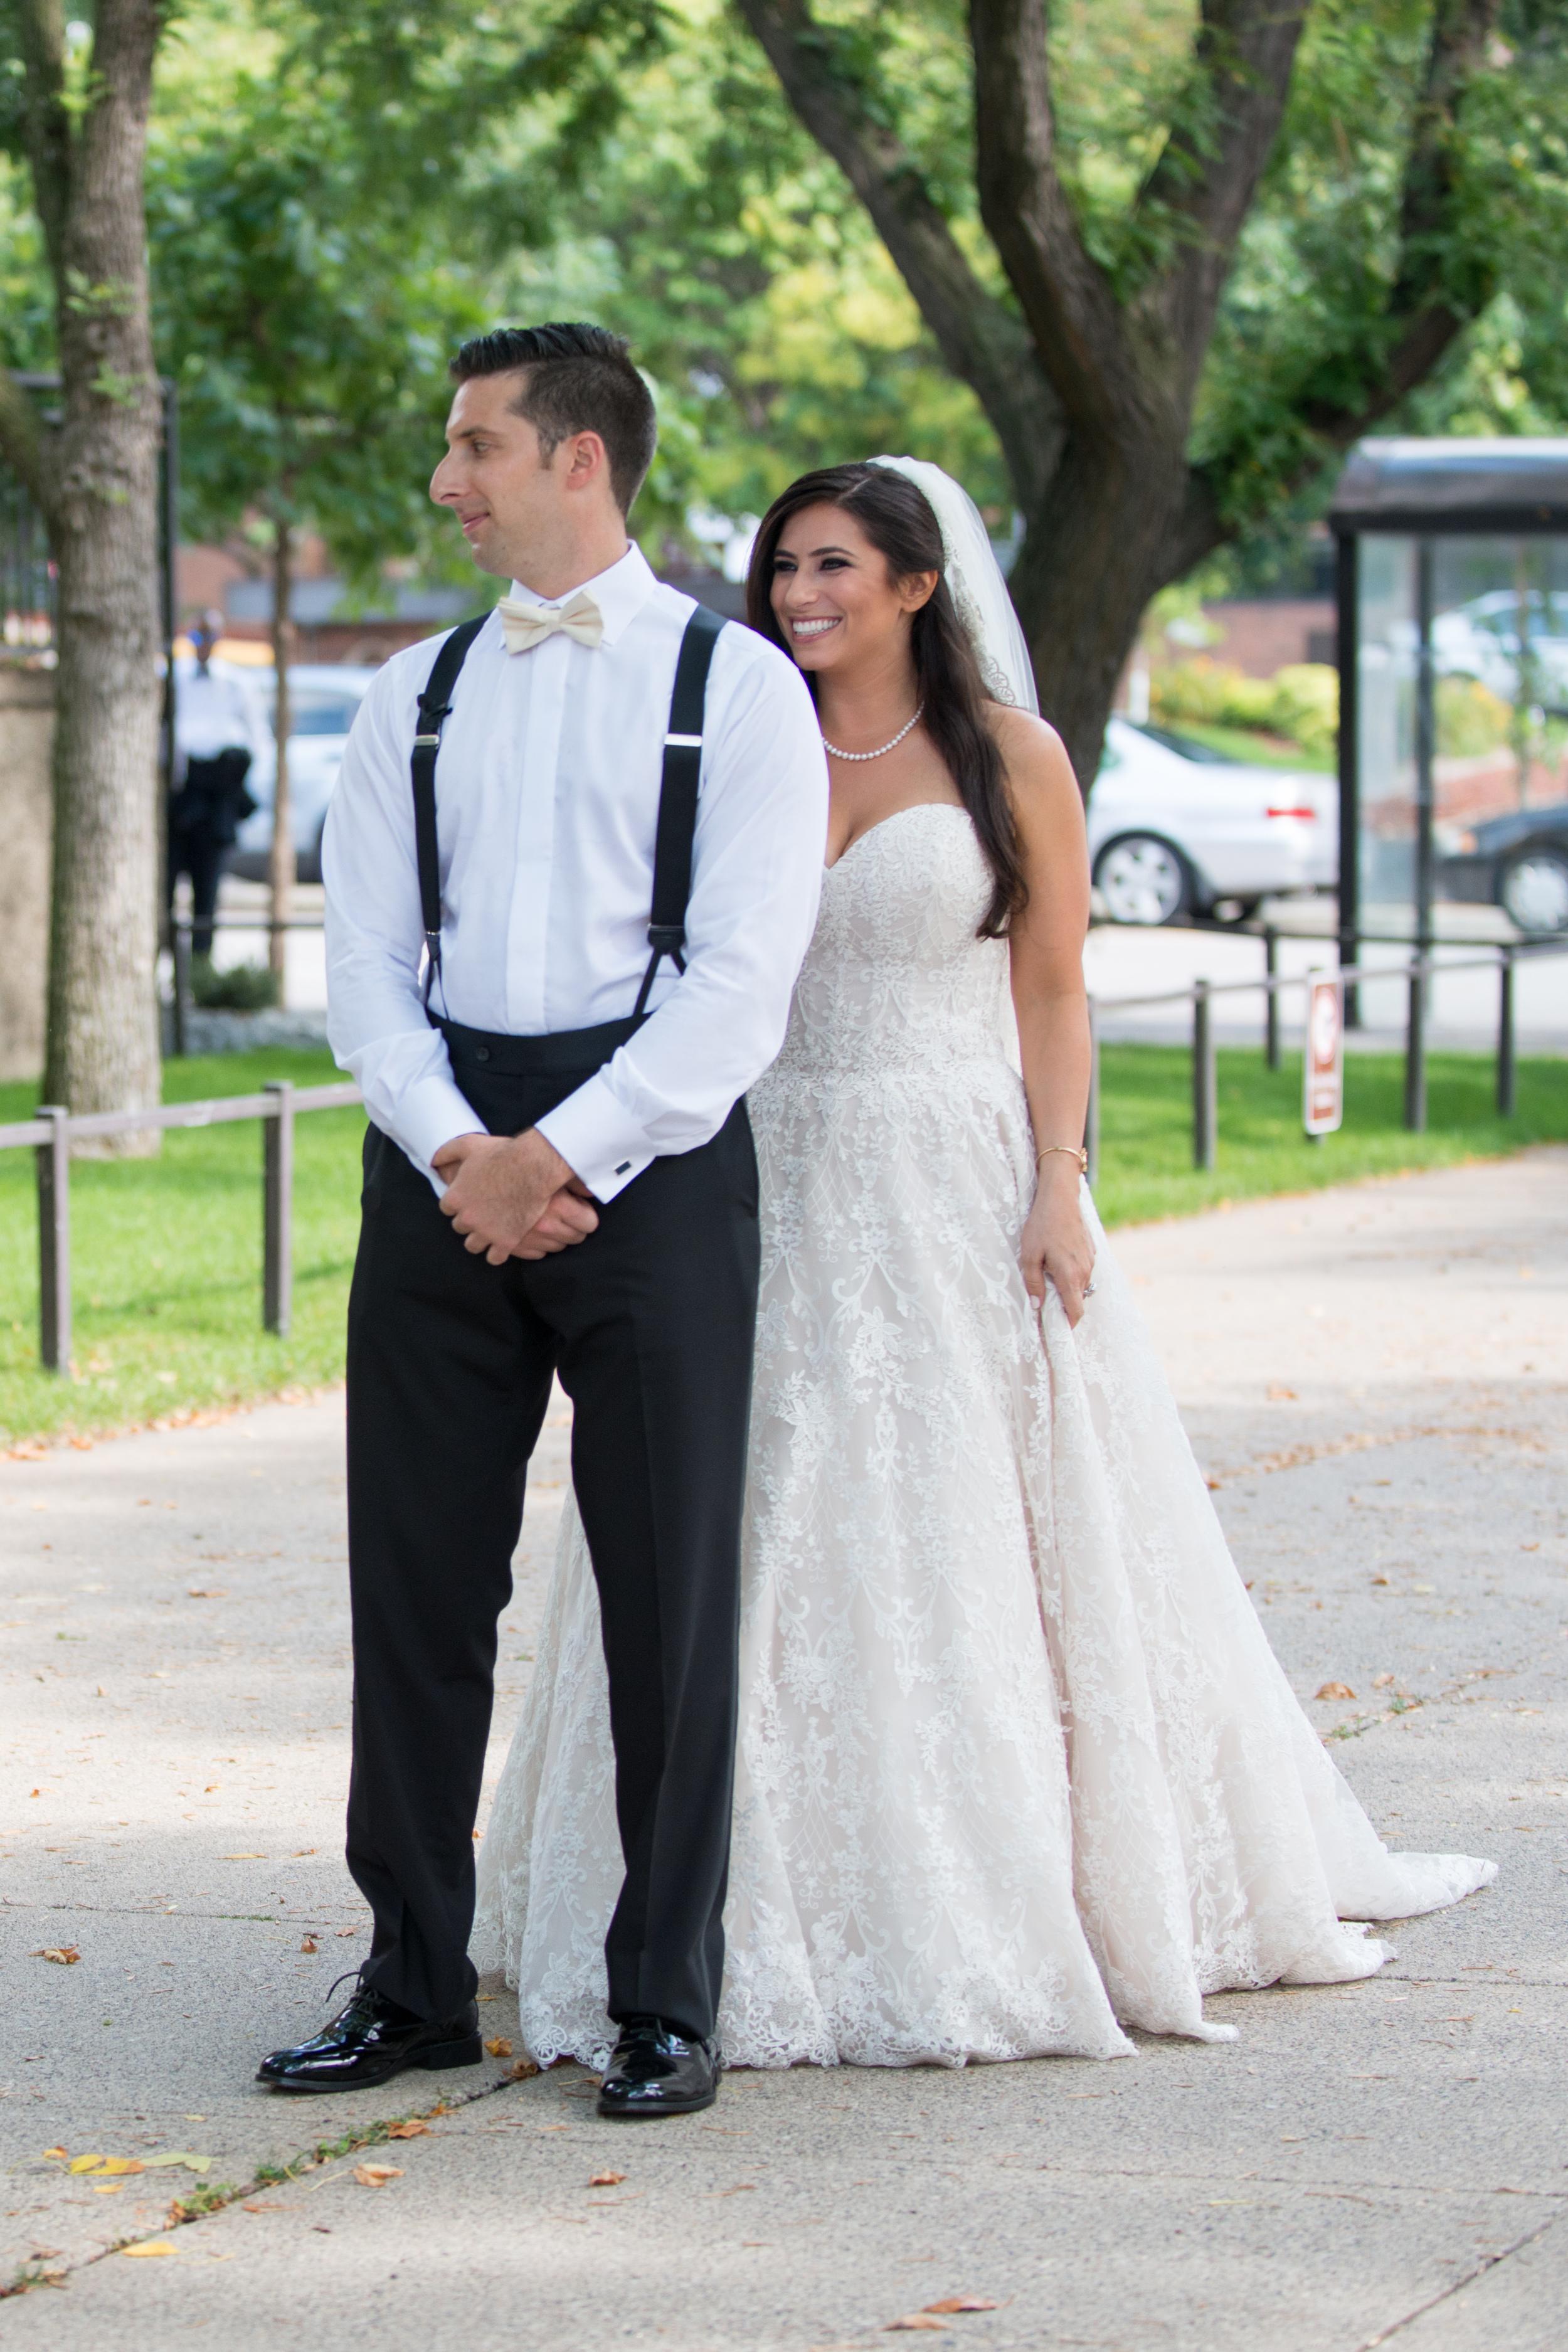 Acowsay_Cinema_MN_Wedding_First_Look.jpg